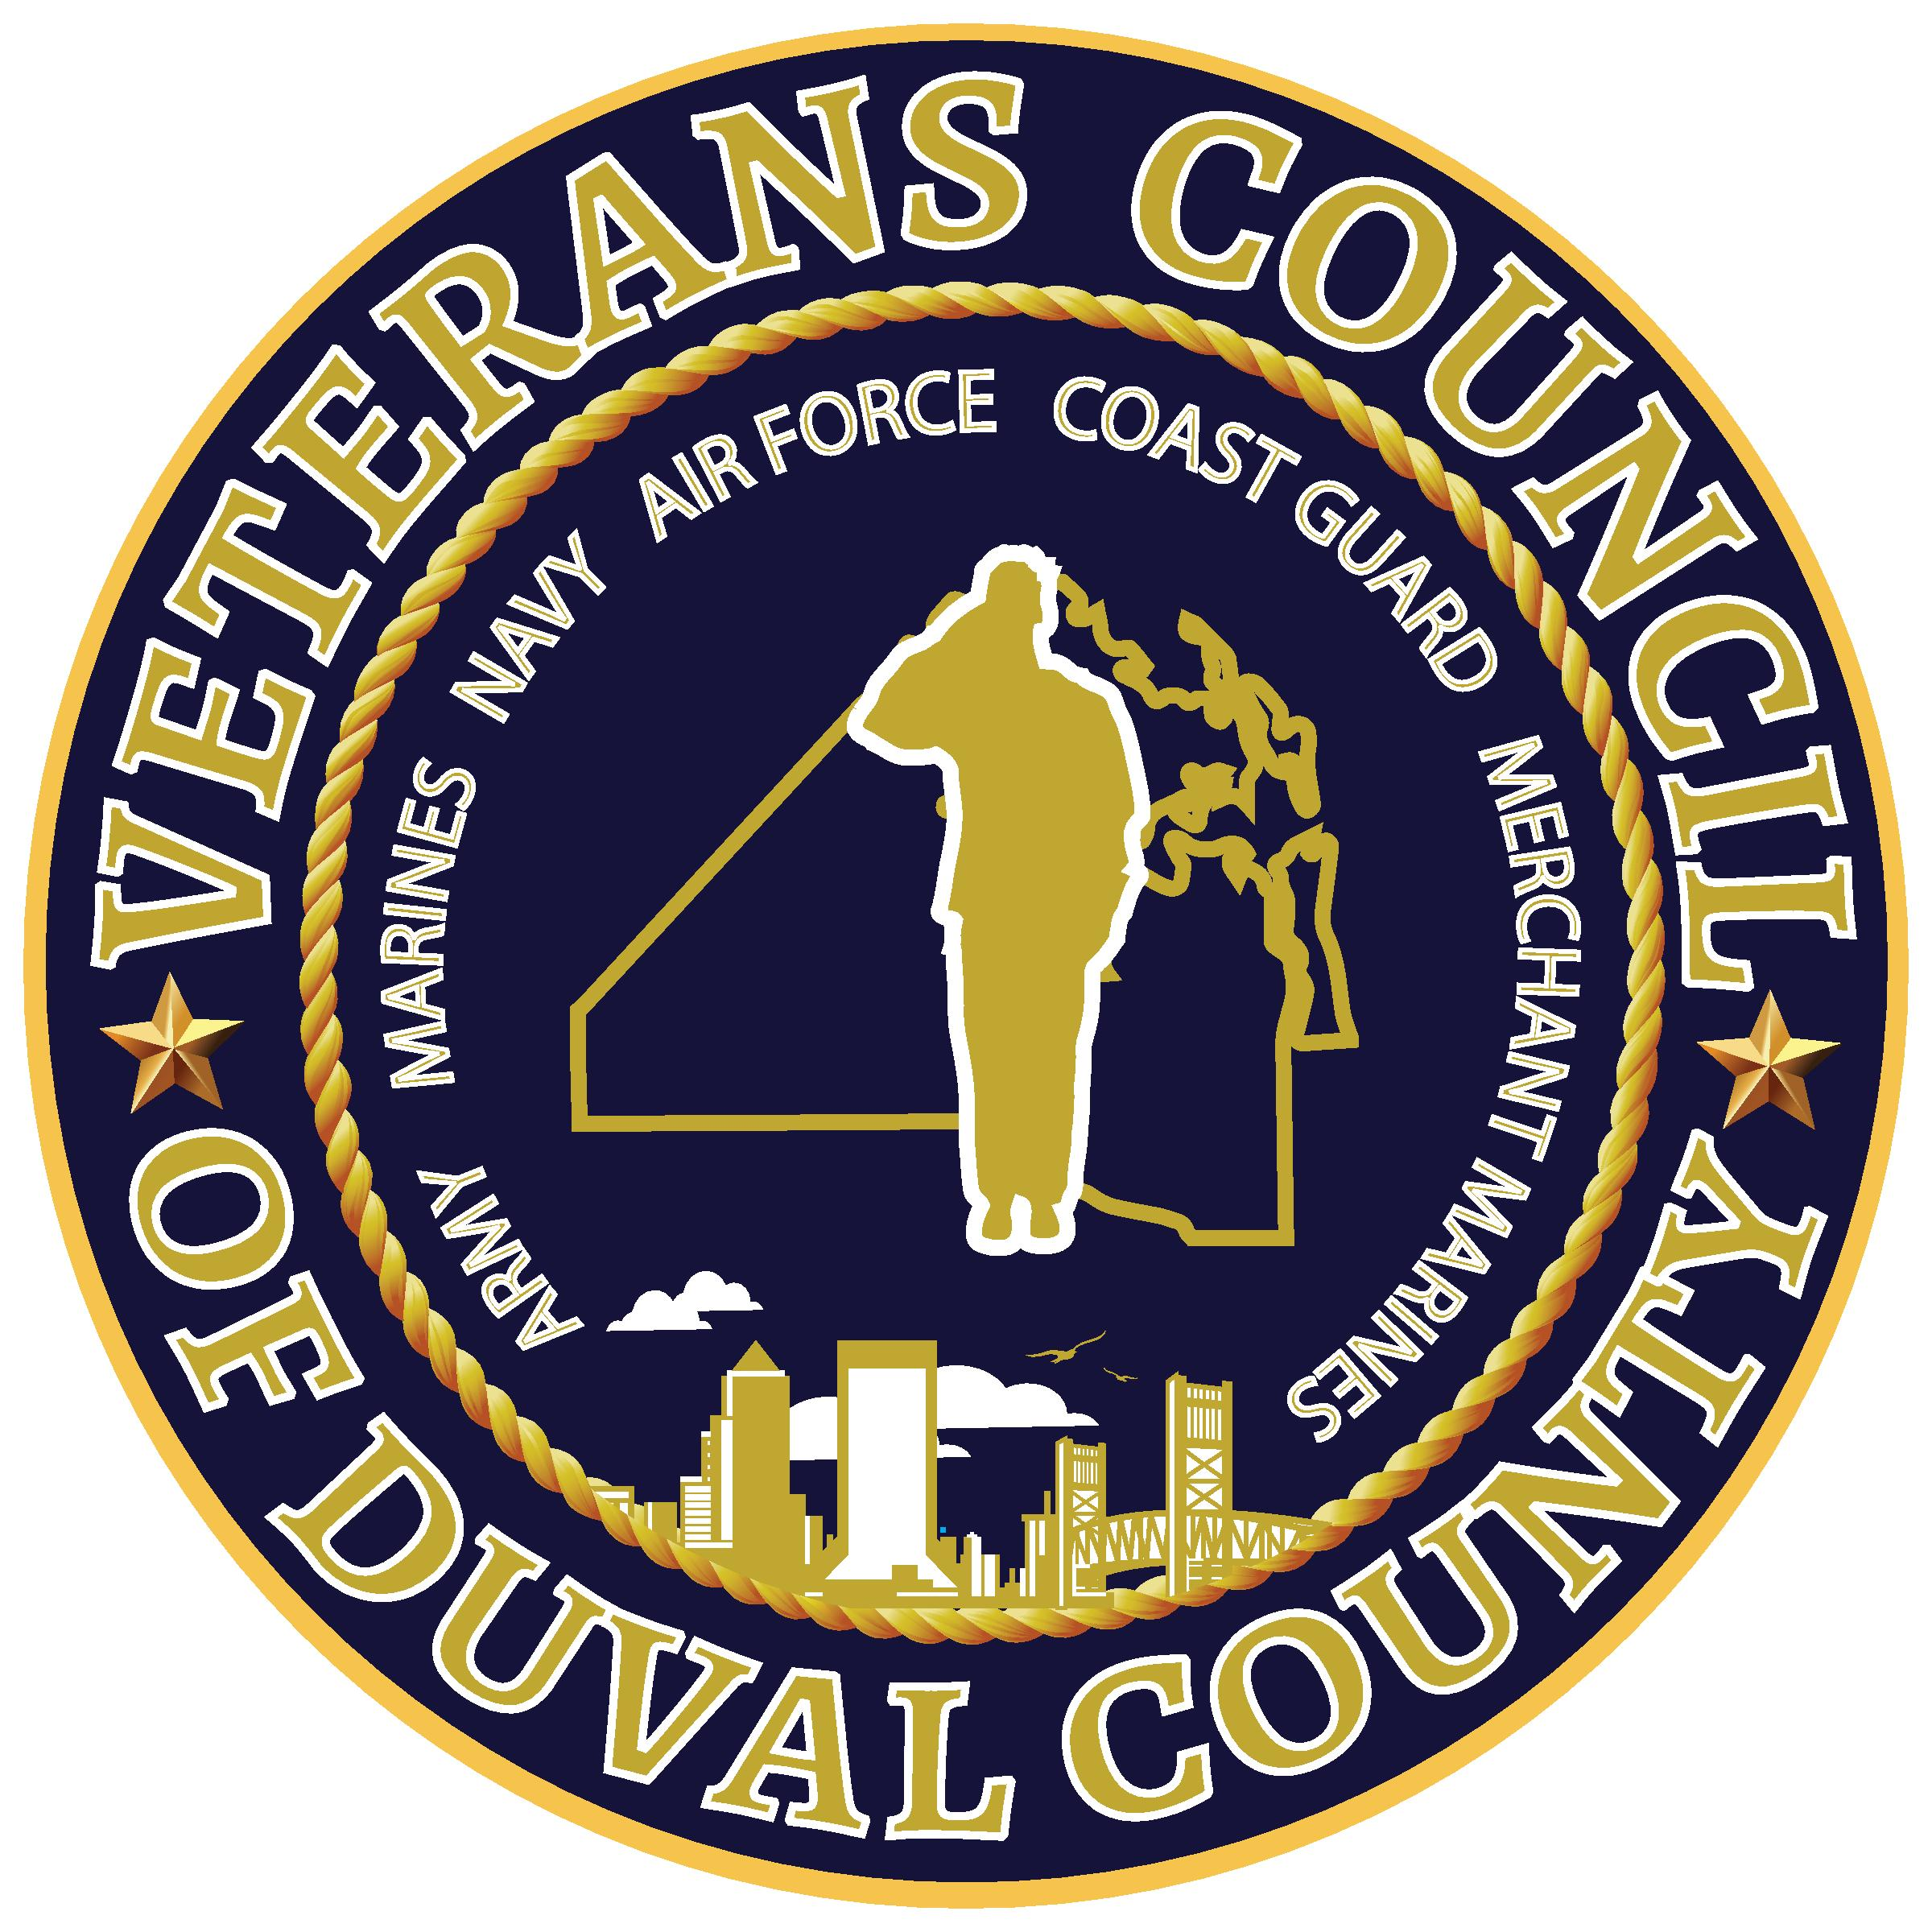 Veterans Council of Duval County Florida